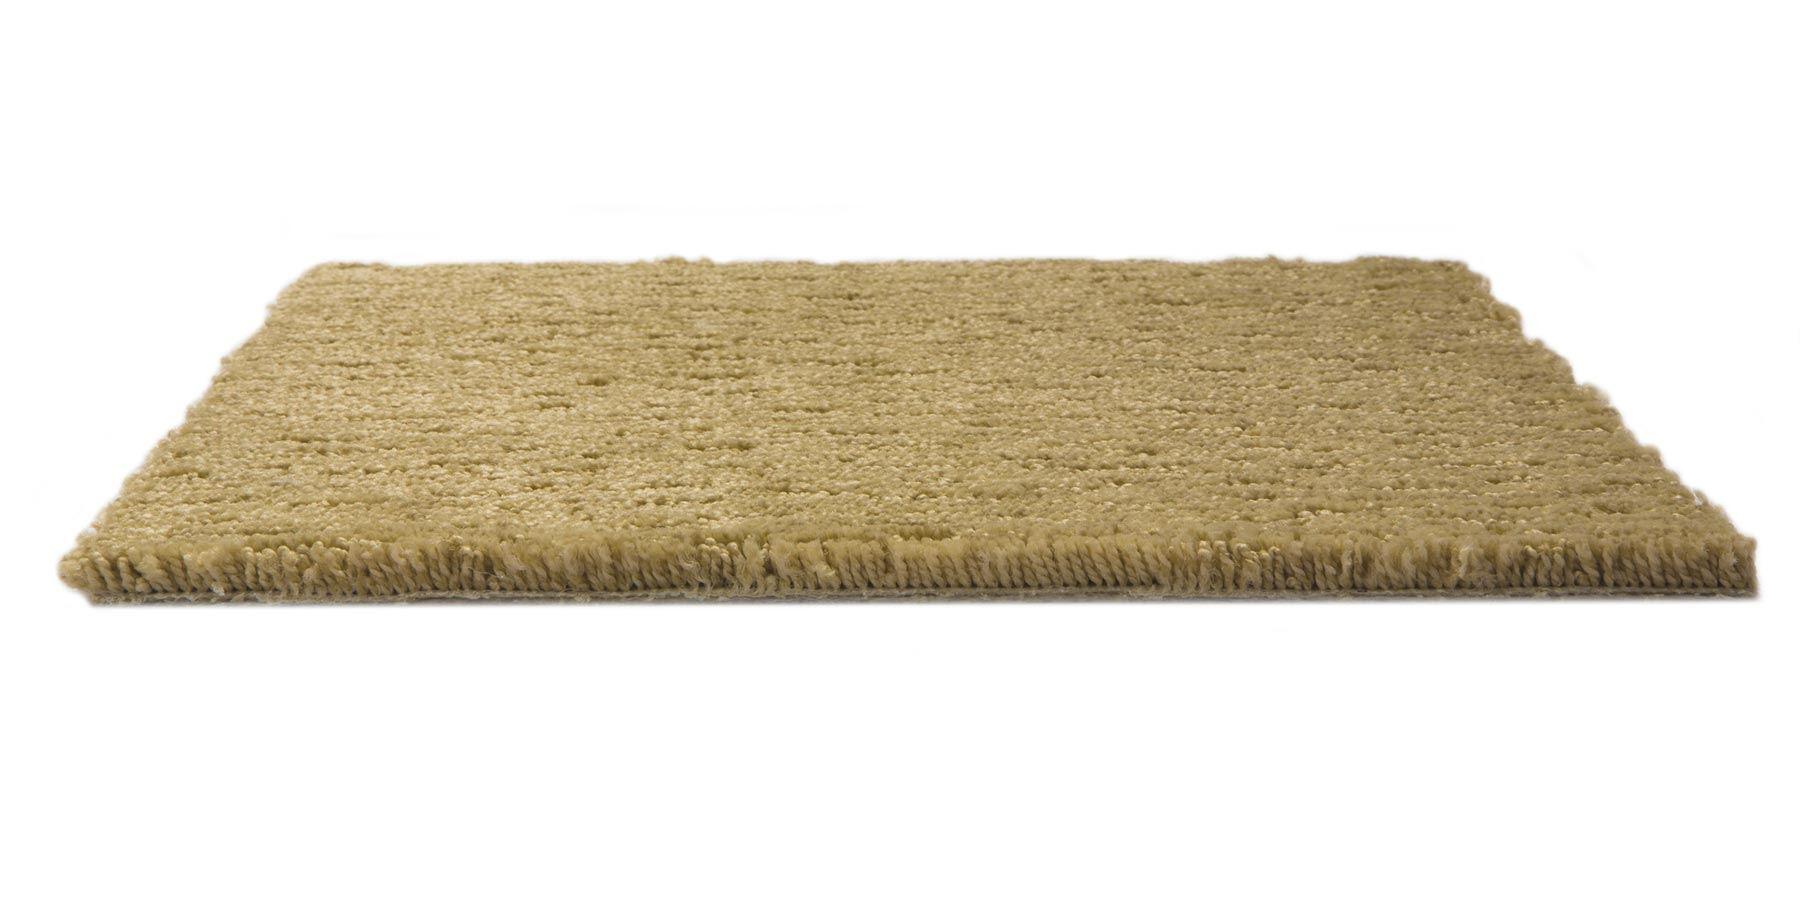 Avio Bronzed Brass Carpet